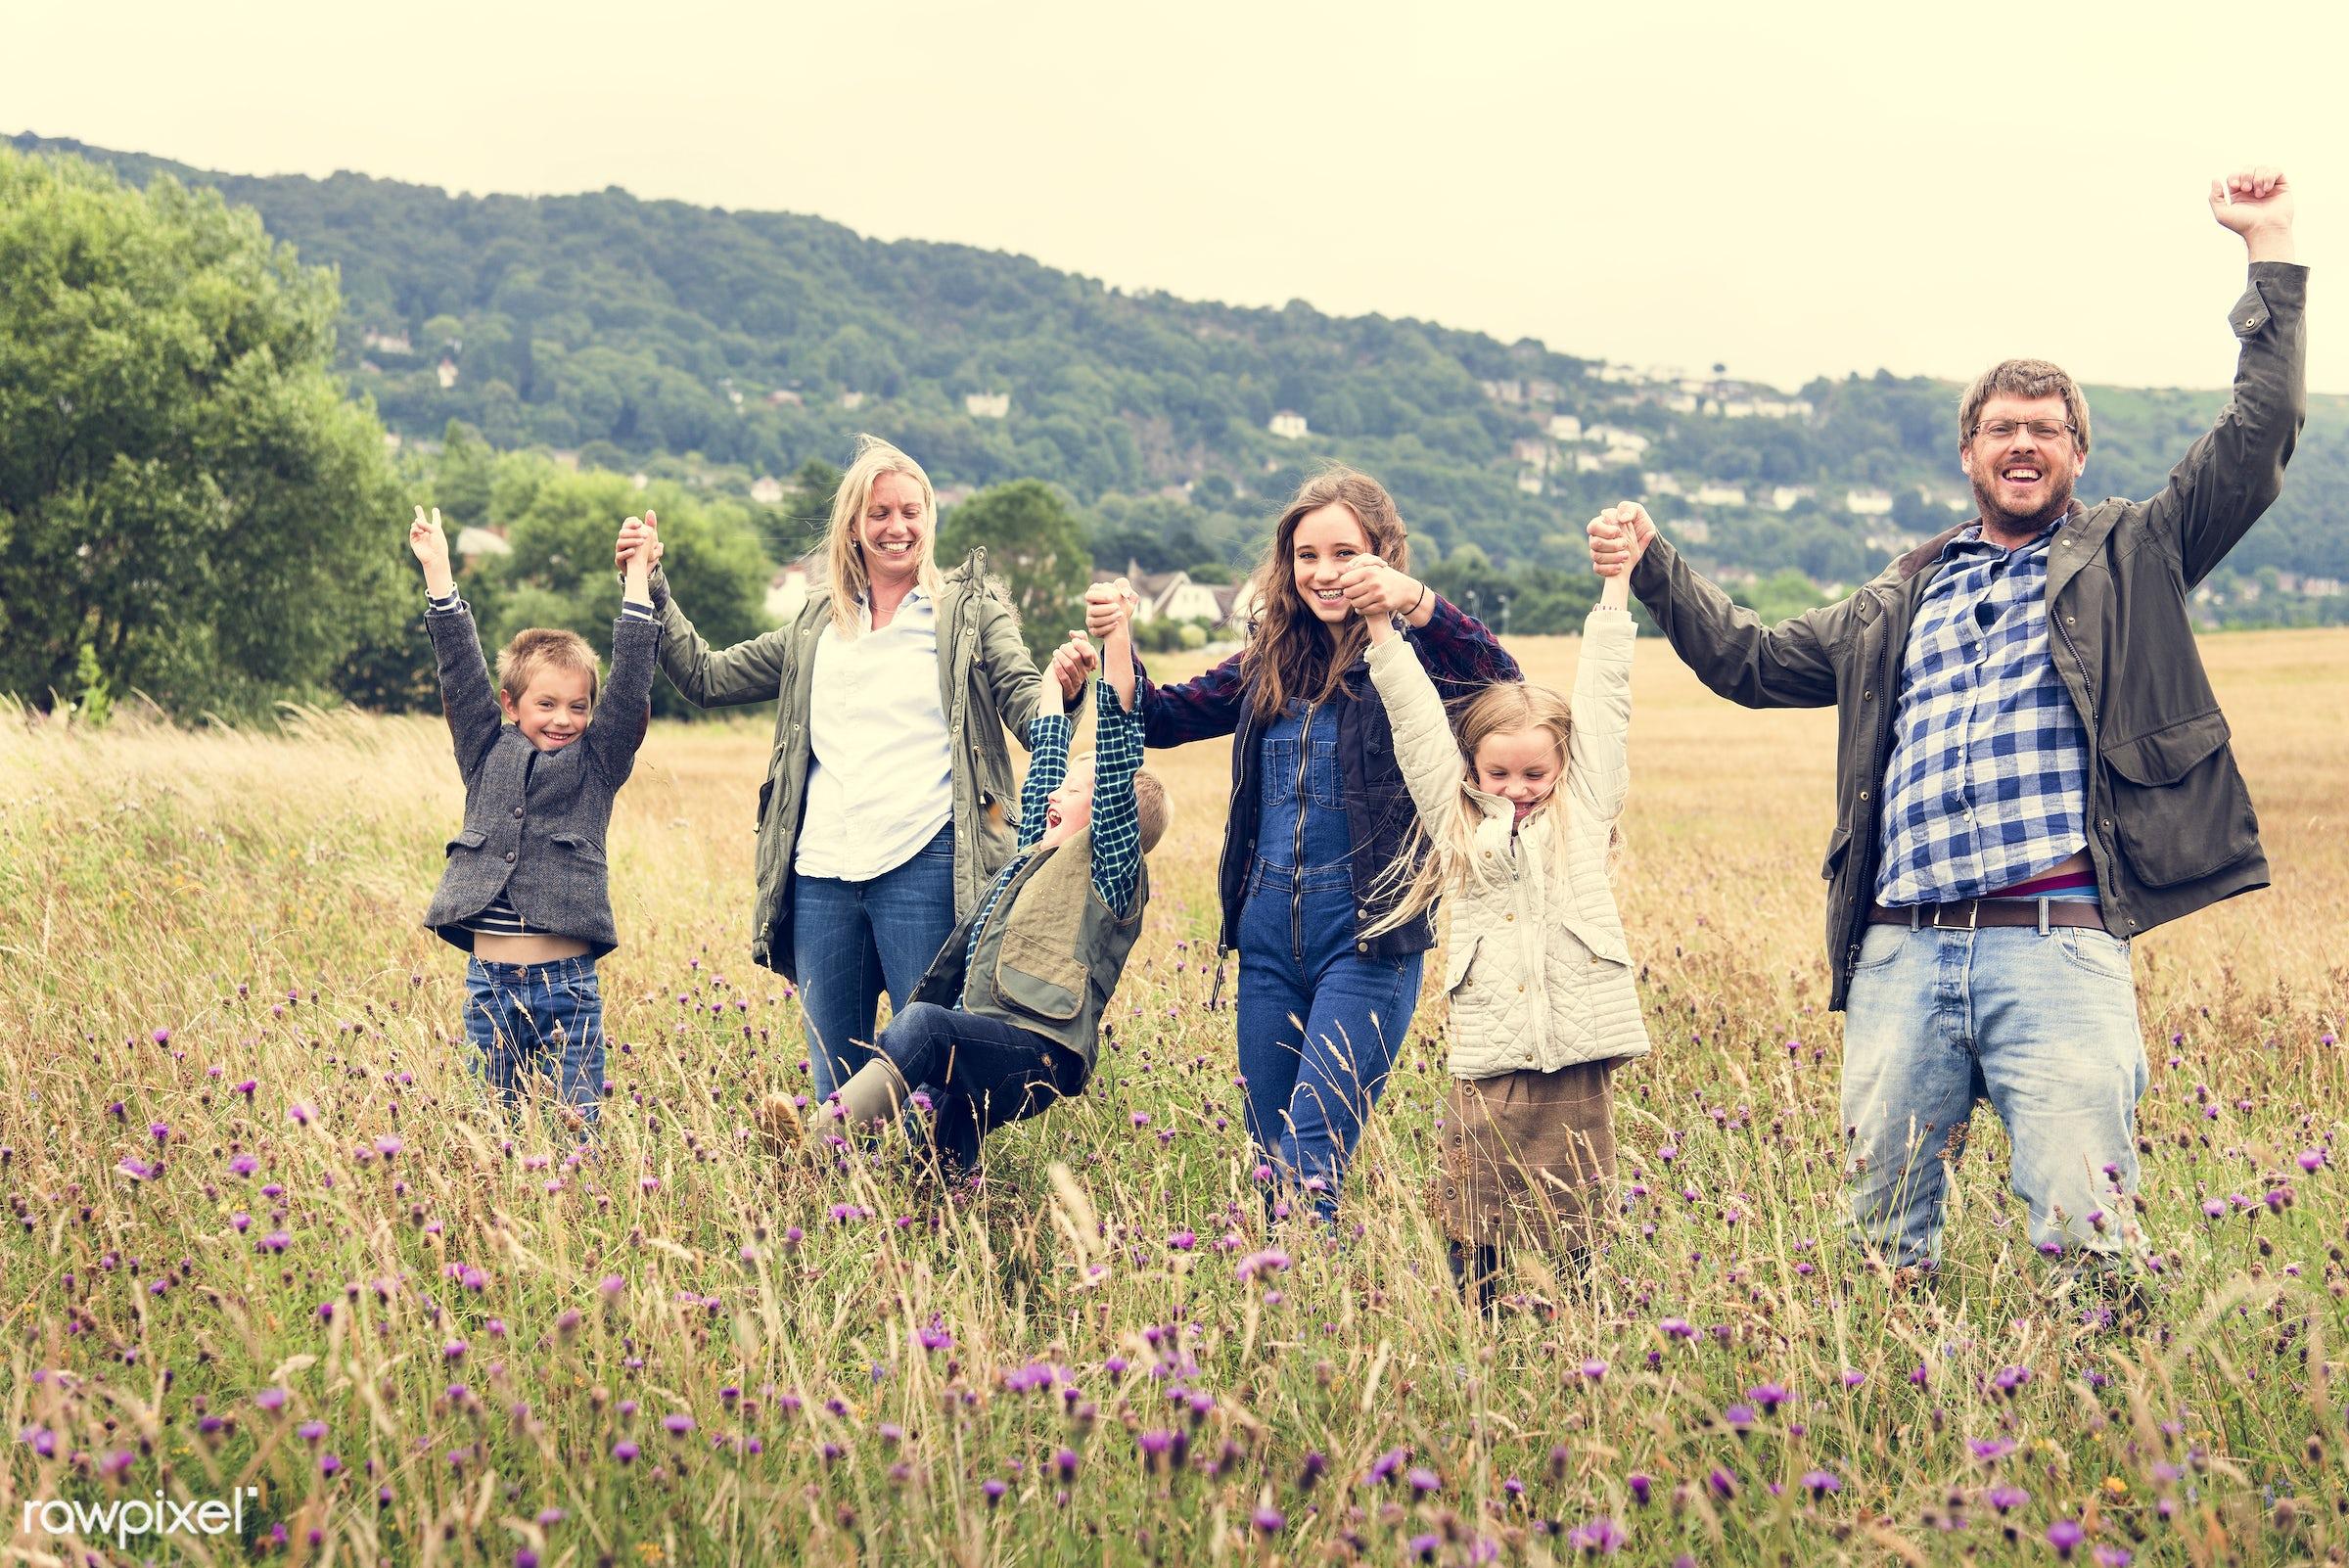 arms raised, bonding, boy, care, casual, celebration, cheerful, childhood, children, daughter, enjoyment, environment,...